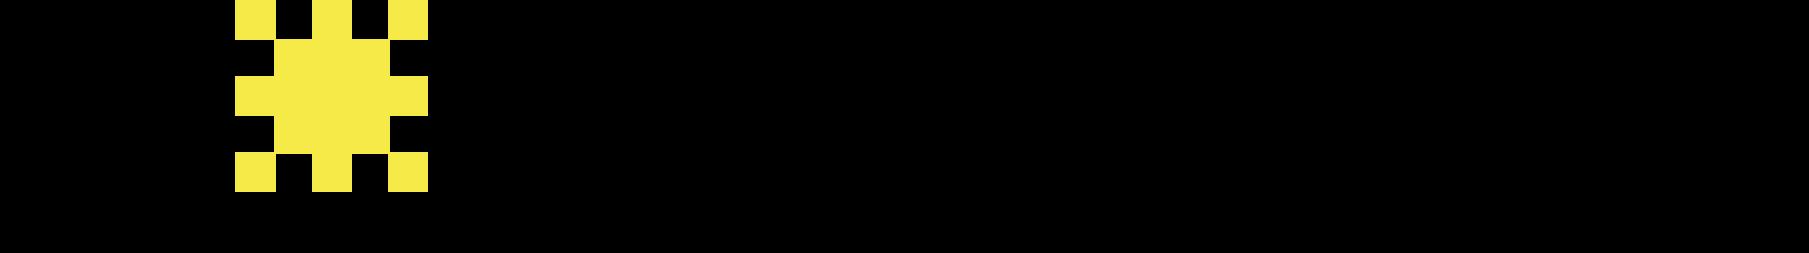 Foto de Logotipo Dopamine